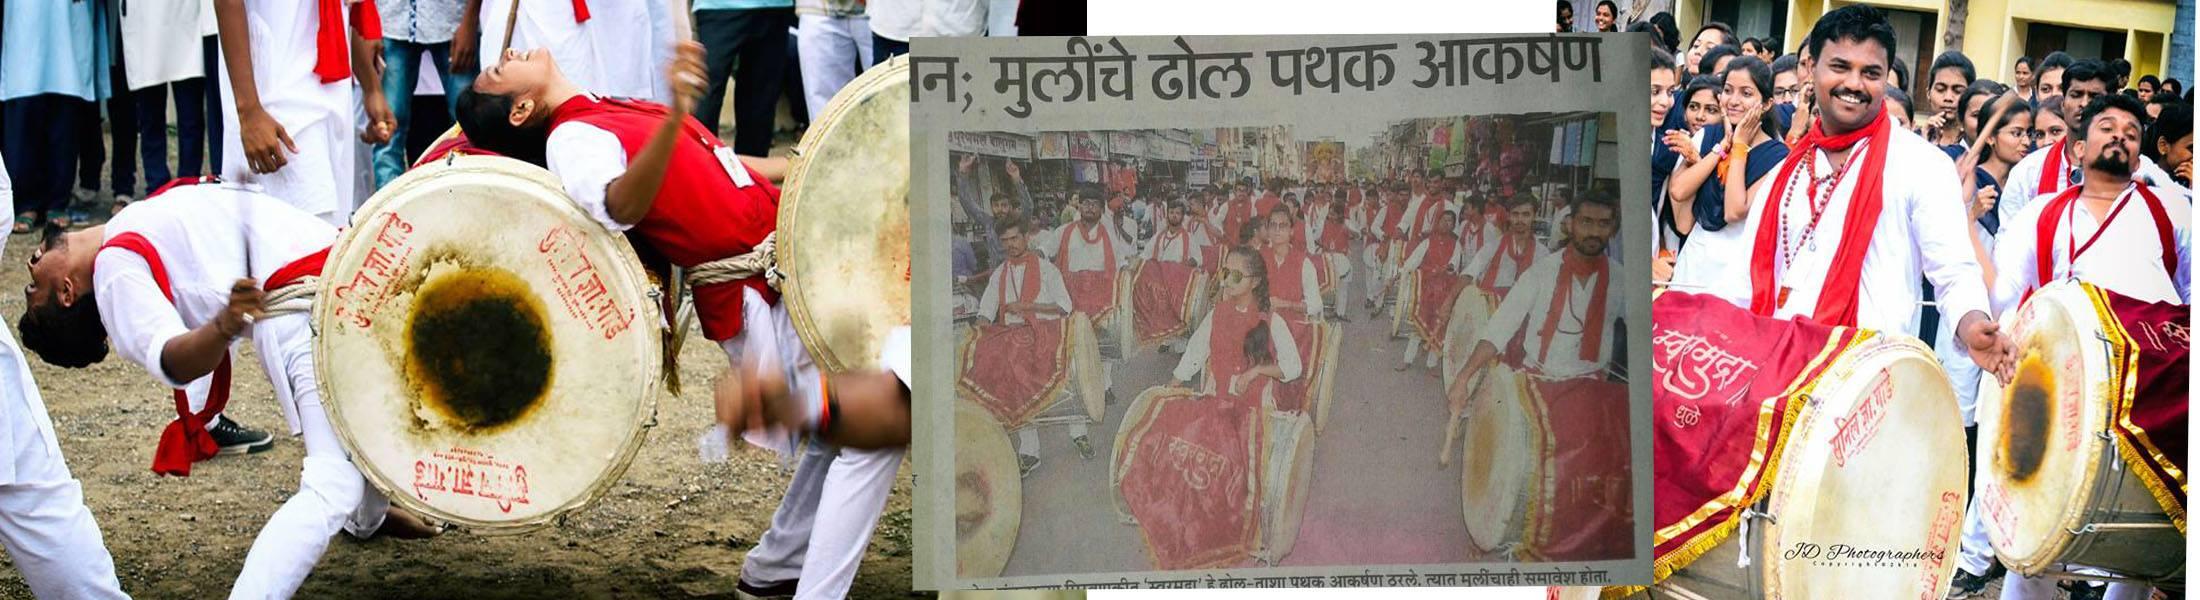 swarmudra-marathipizza03